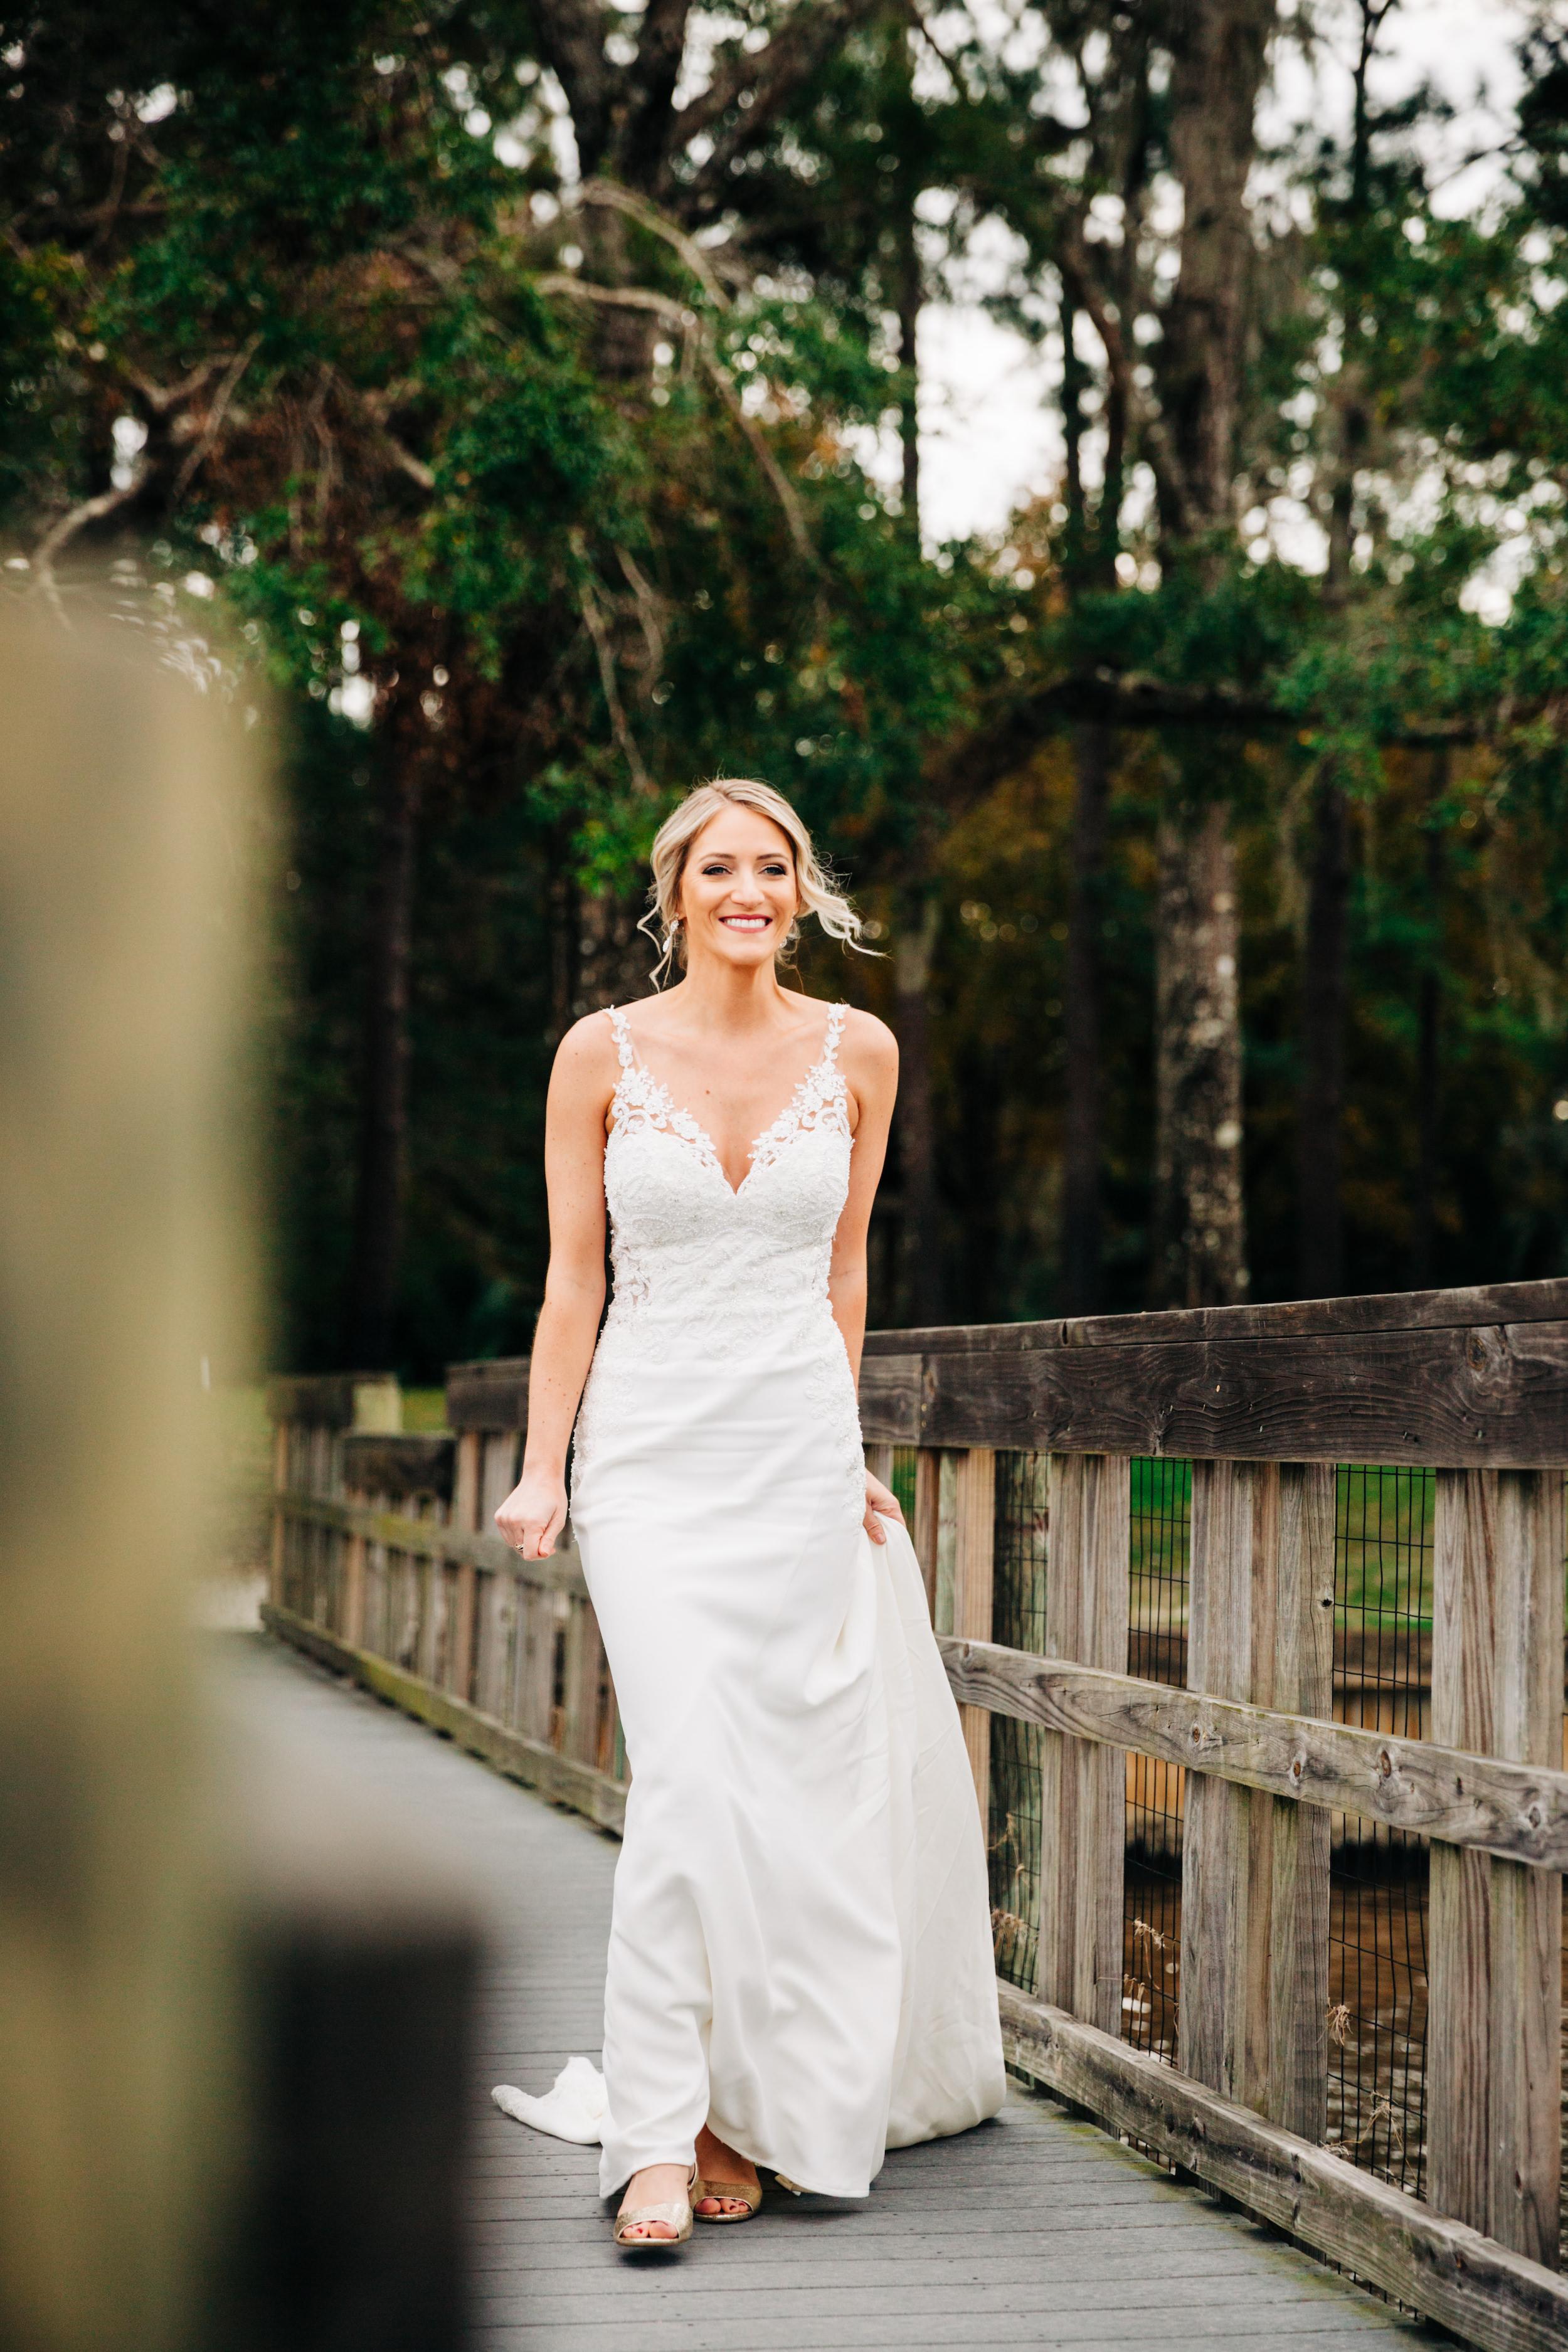 Ricky & Brittney - Pre Ceremony - Jake & Katie Photography_318.jpg